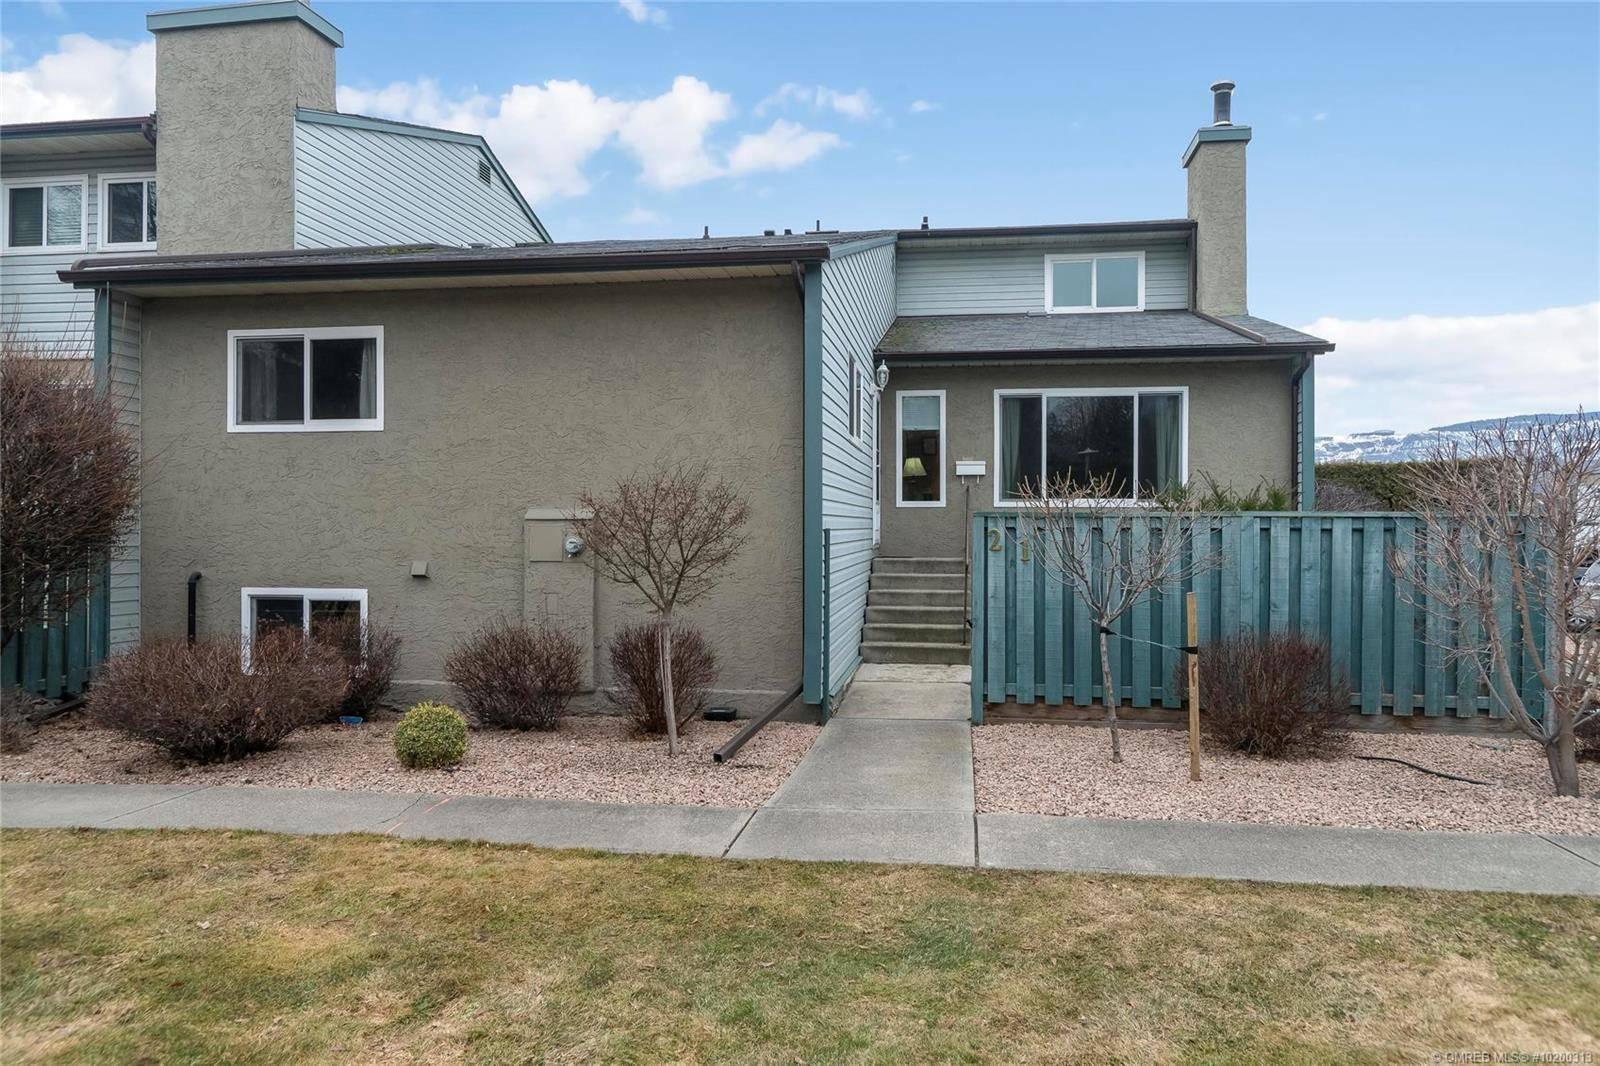 Townhouse for sale at 1471 Inkar Rd Unit 21 Kelowna British Columbia - MLS: 10200313